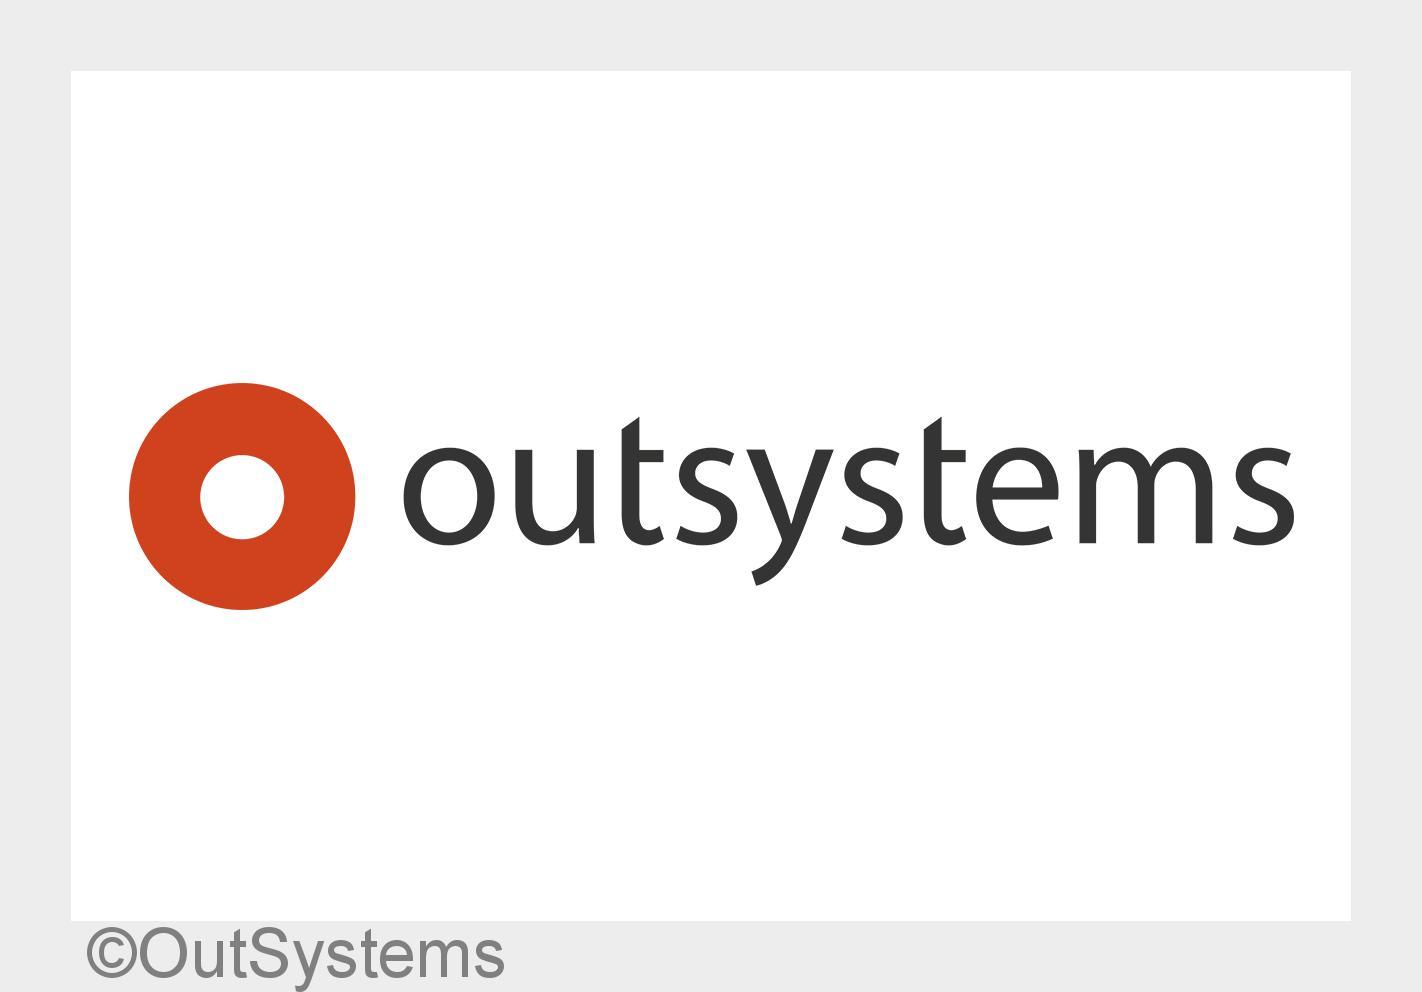 Hackney Council: Verbesserte digitale Services dank OutSystems